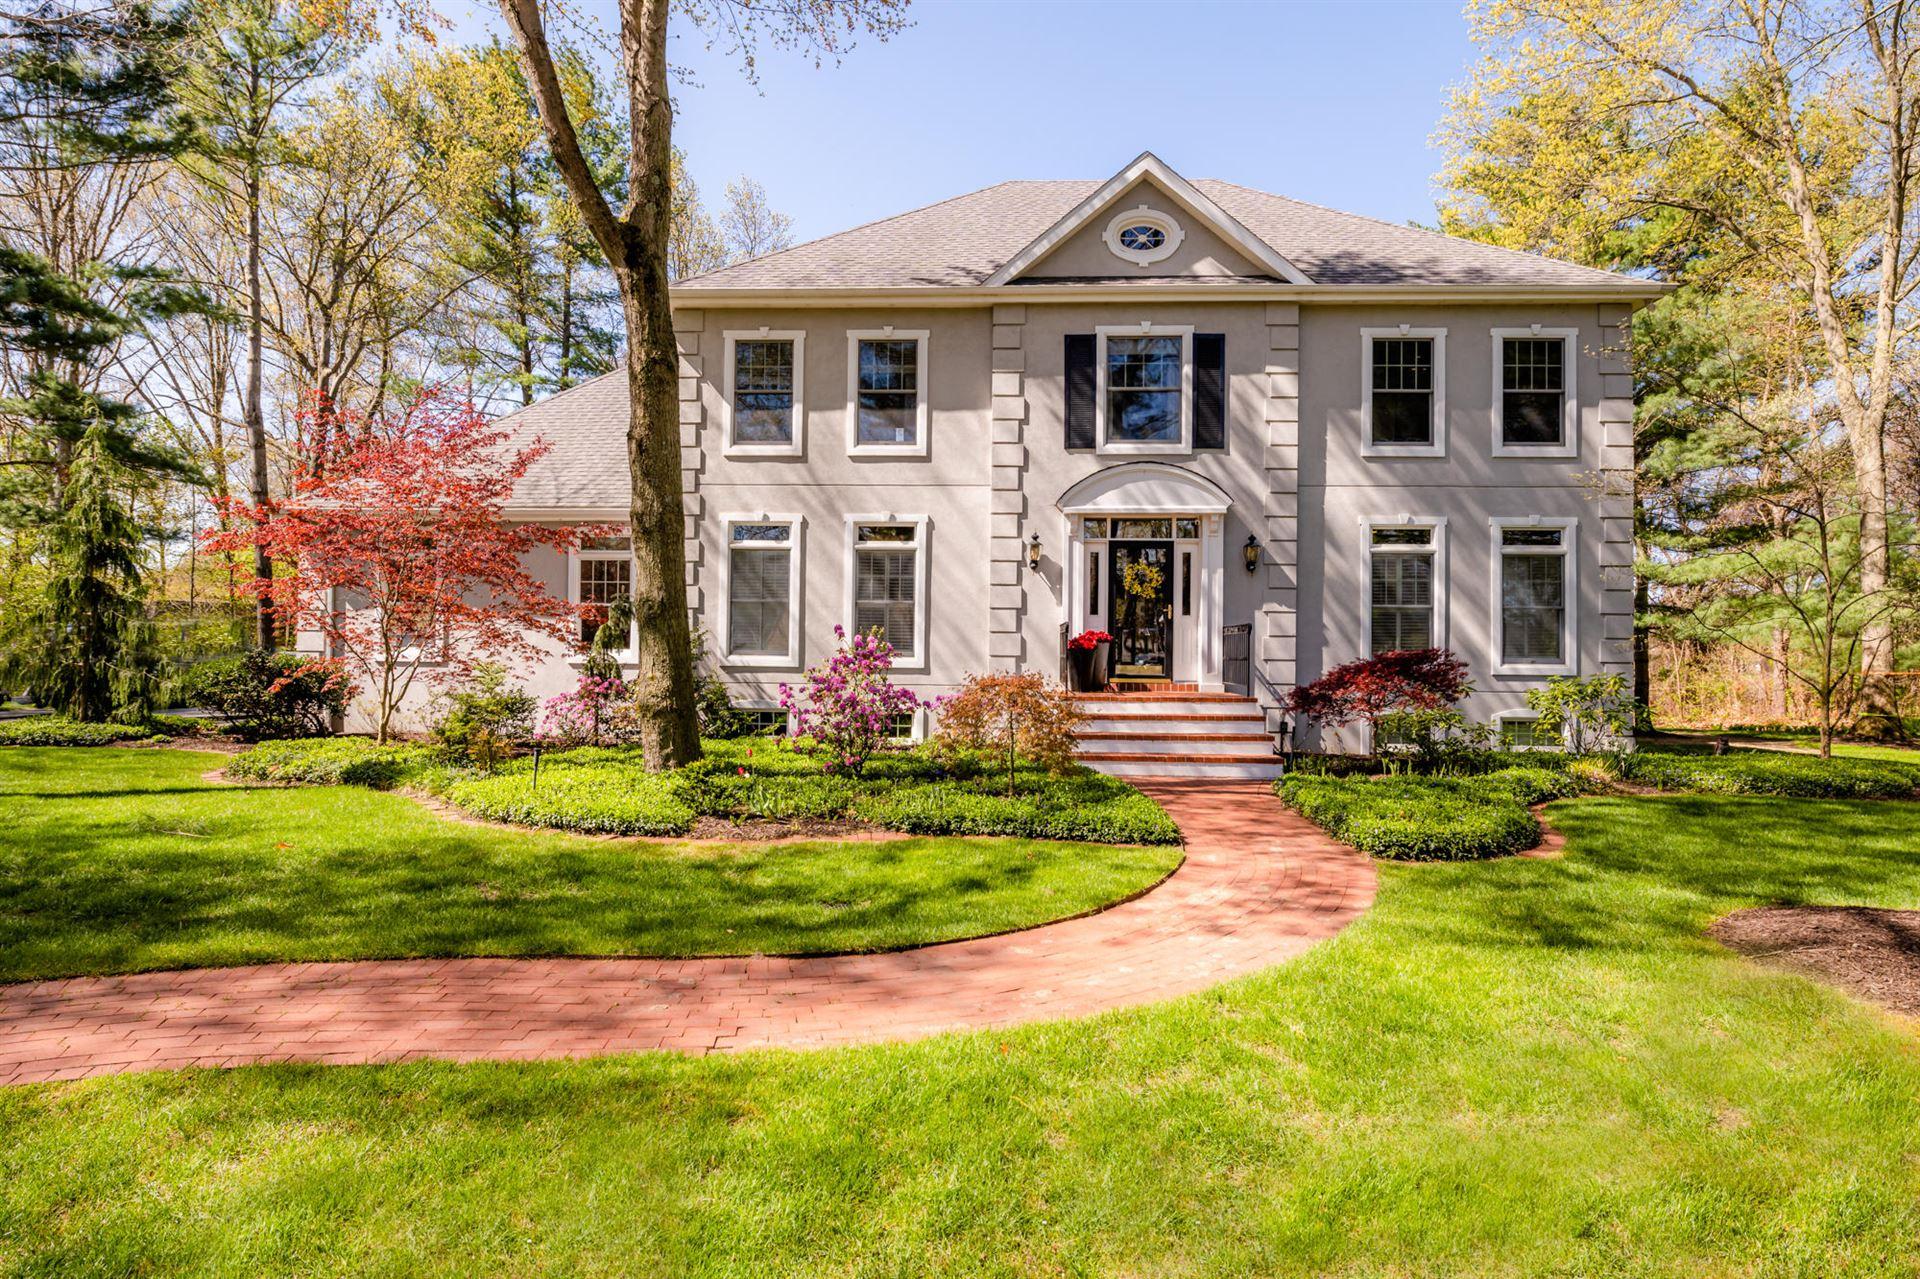 3284 Estates Drive, Saint Joseph, MI 49085 - MLS#: 21019071